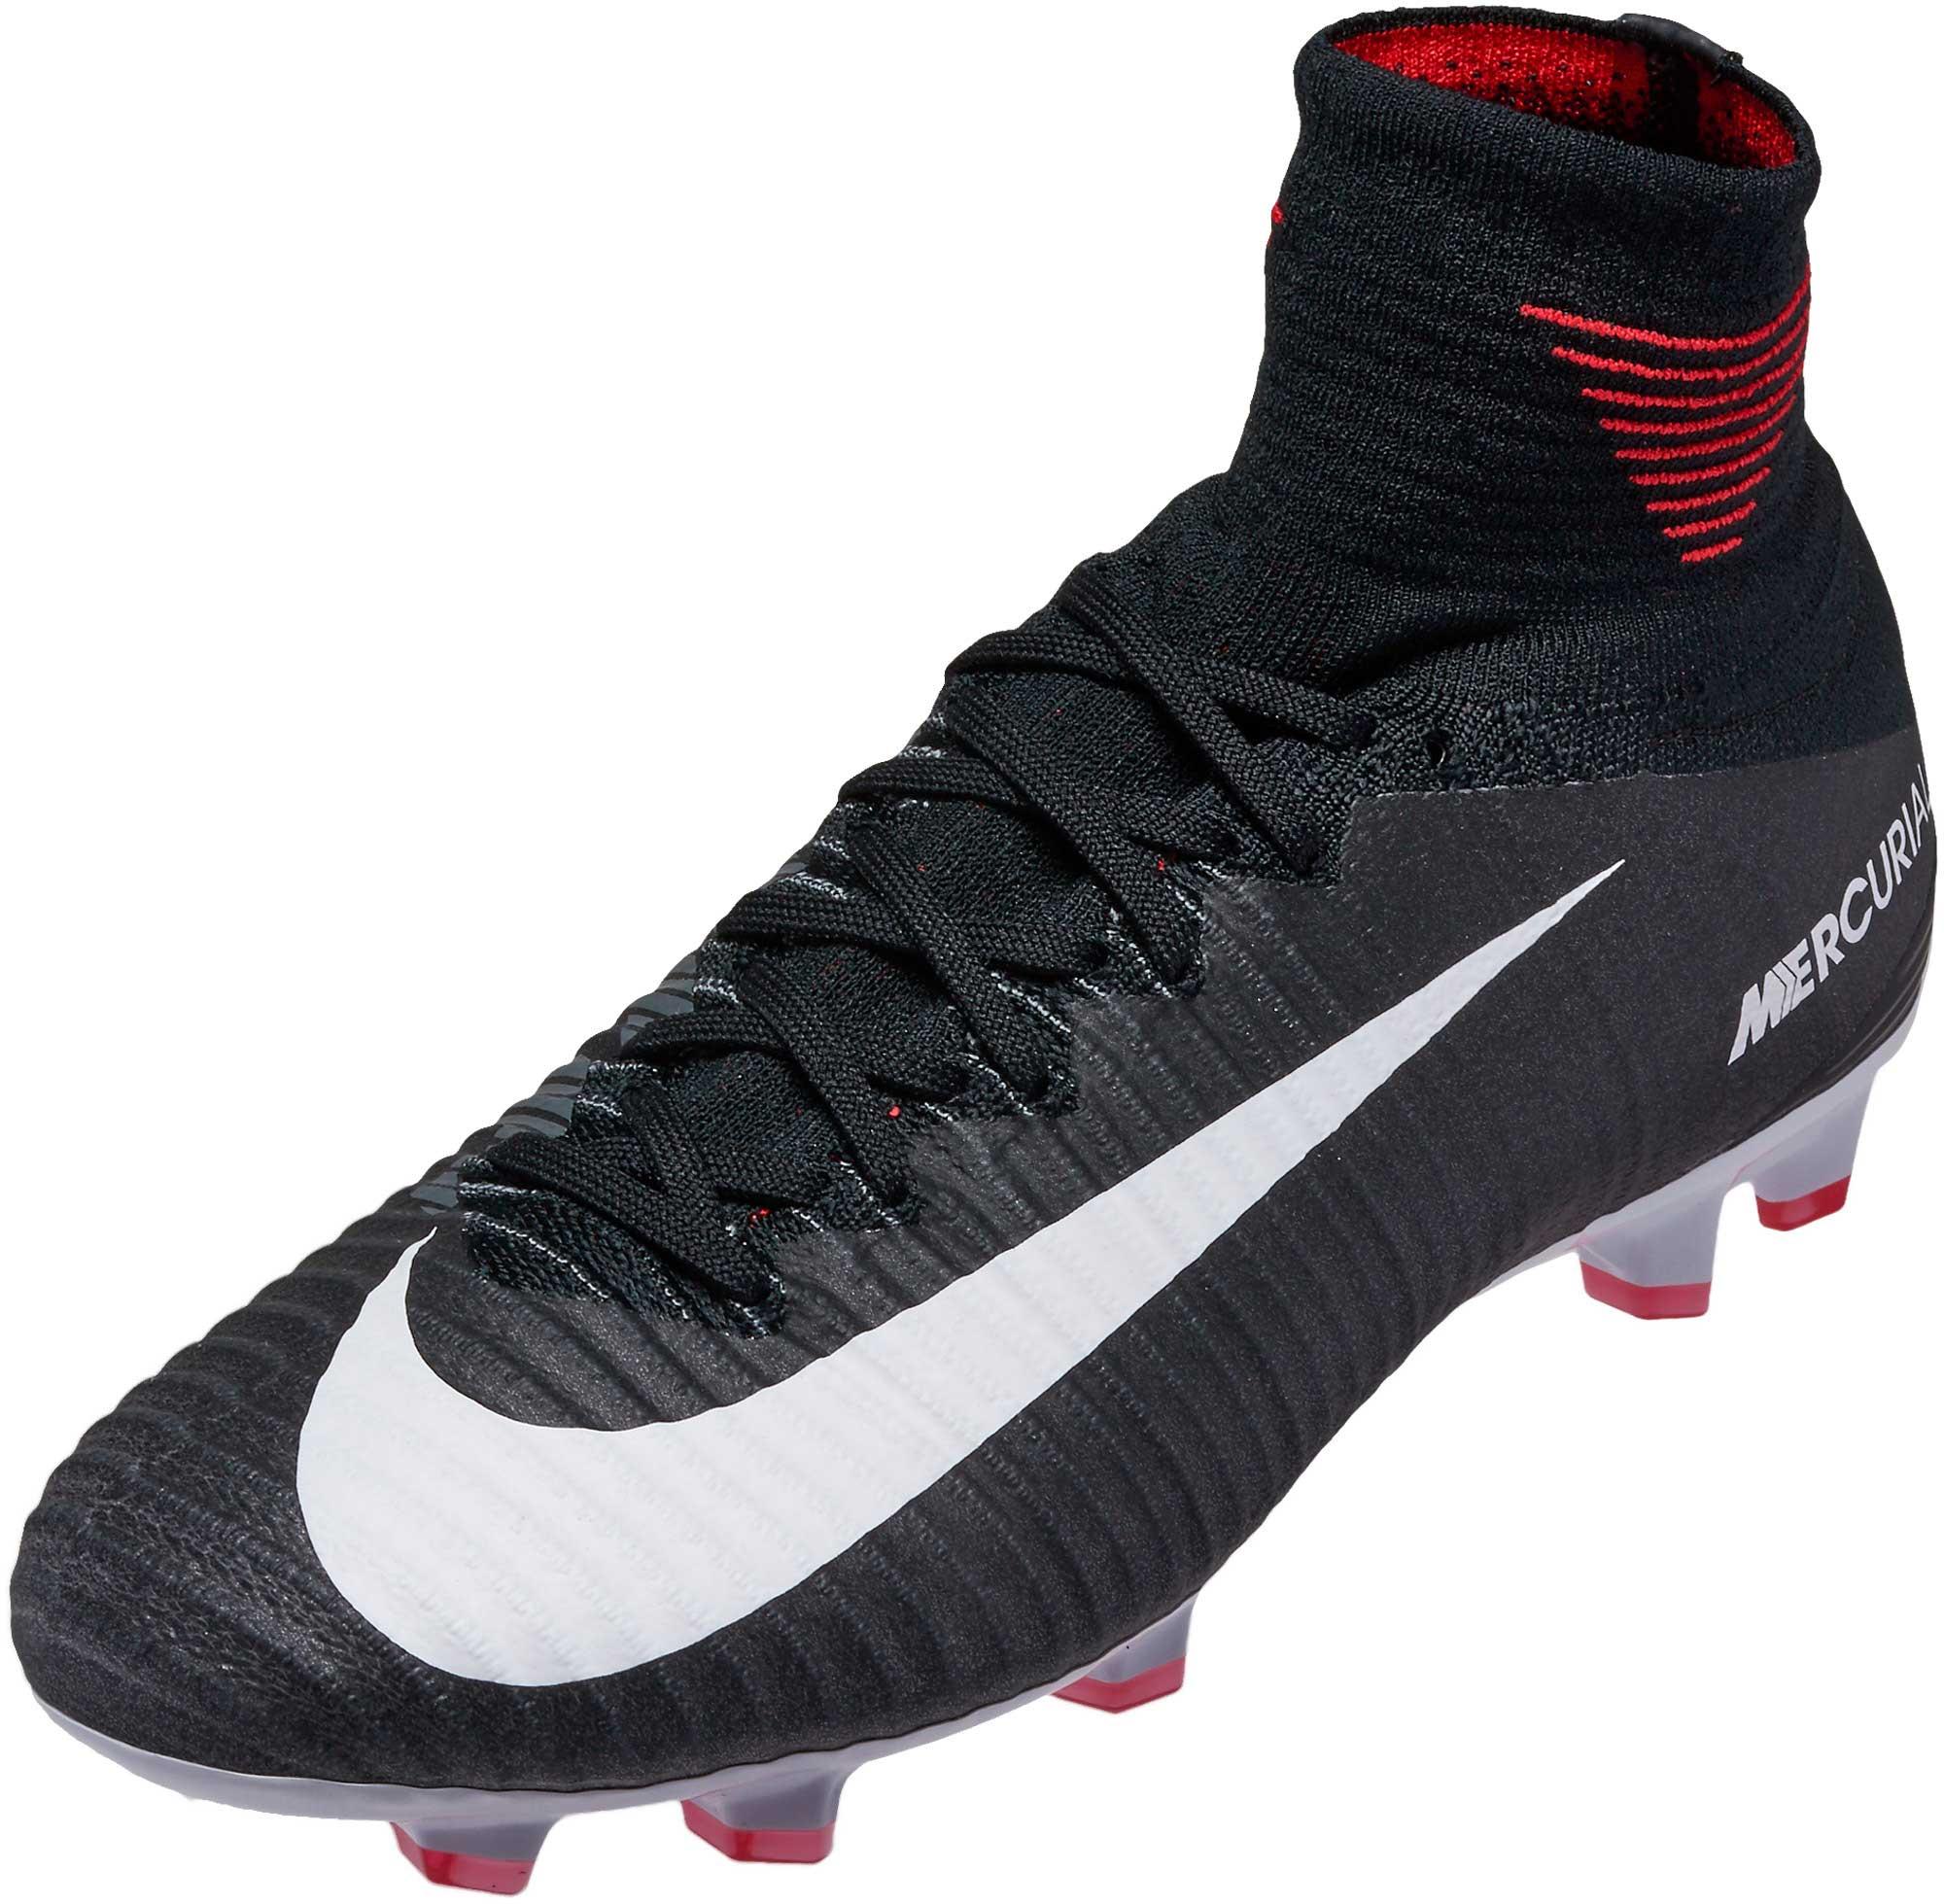 various colors 1efd1 d5960 Nike Kids Mercurial Superfly V FG - Black Soccer Cleats